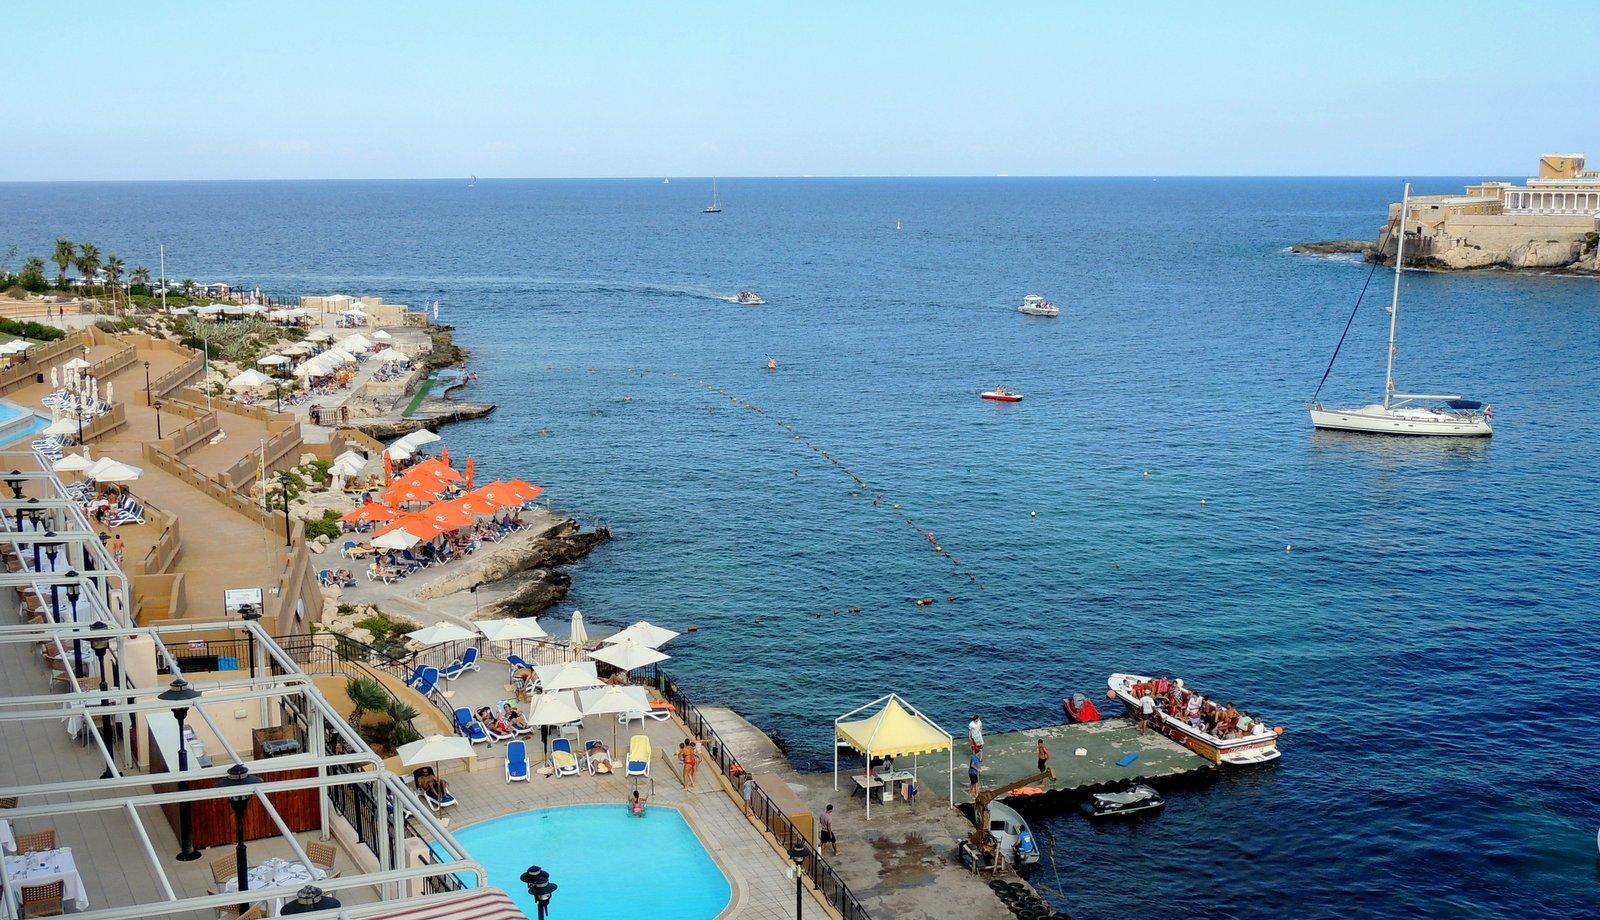 Marina Hotel at the Corinthian Beach Resort - Malta